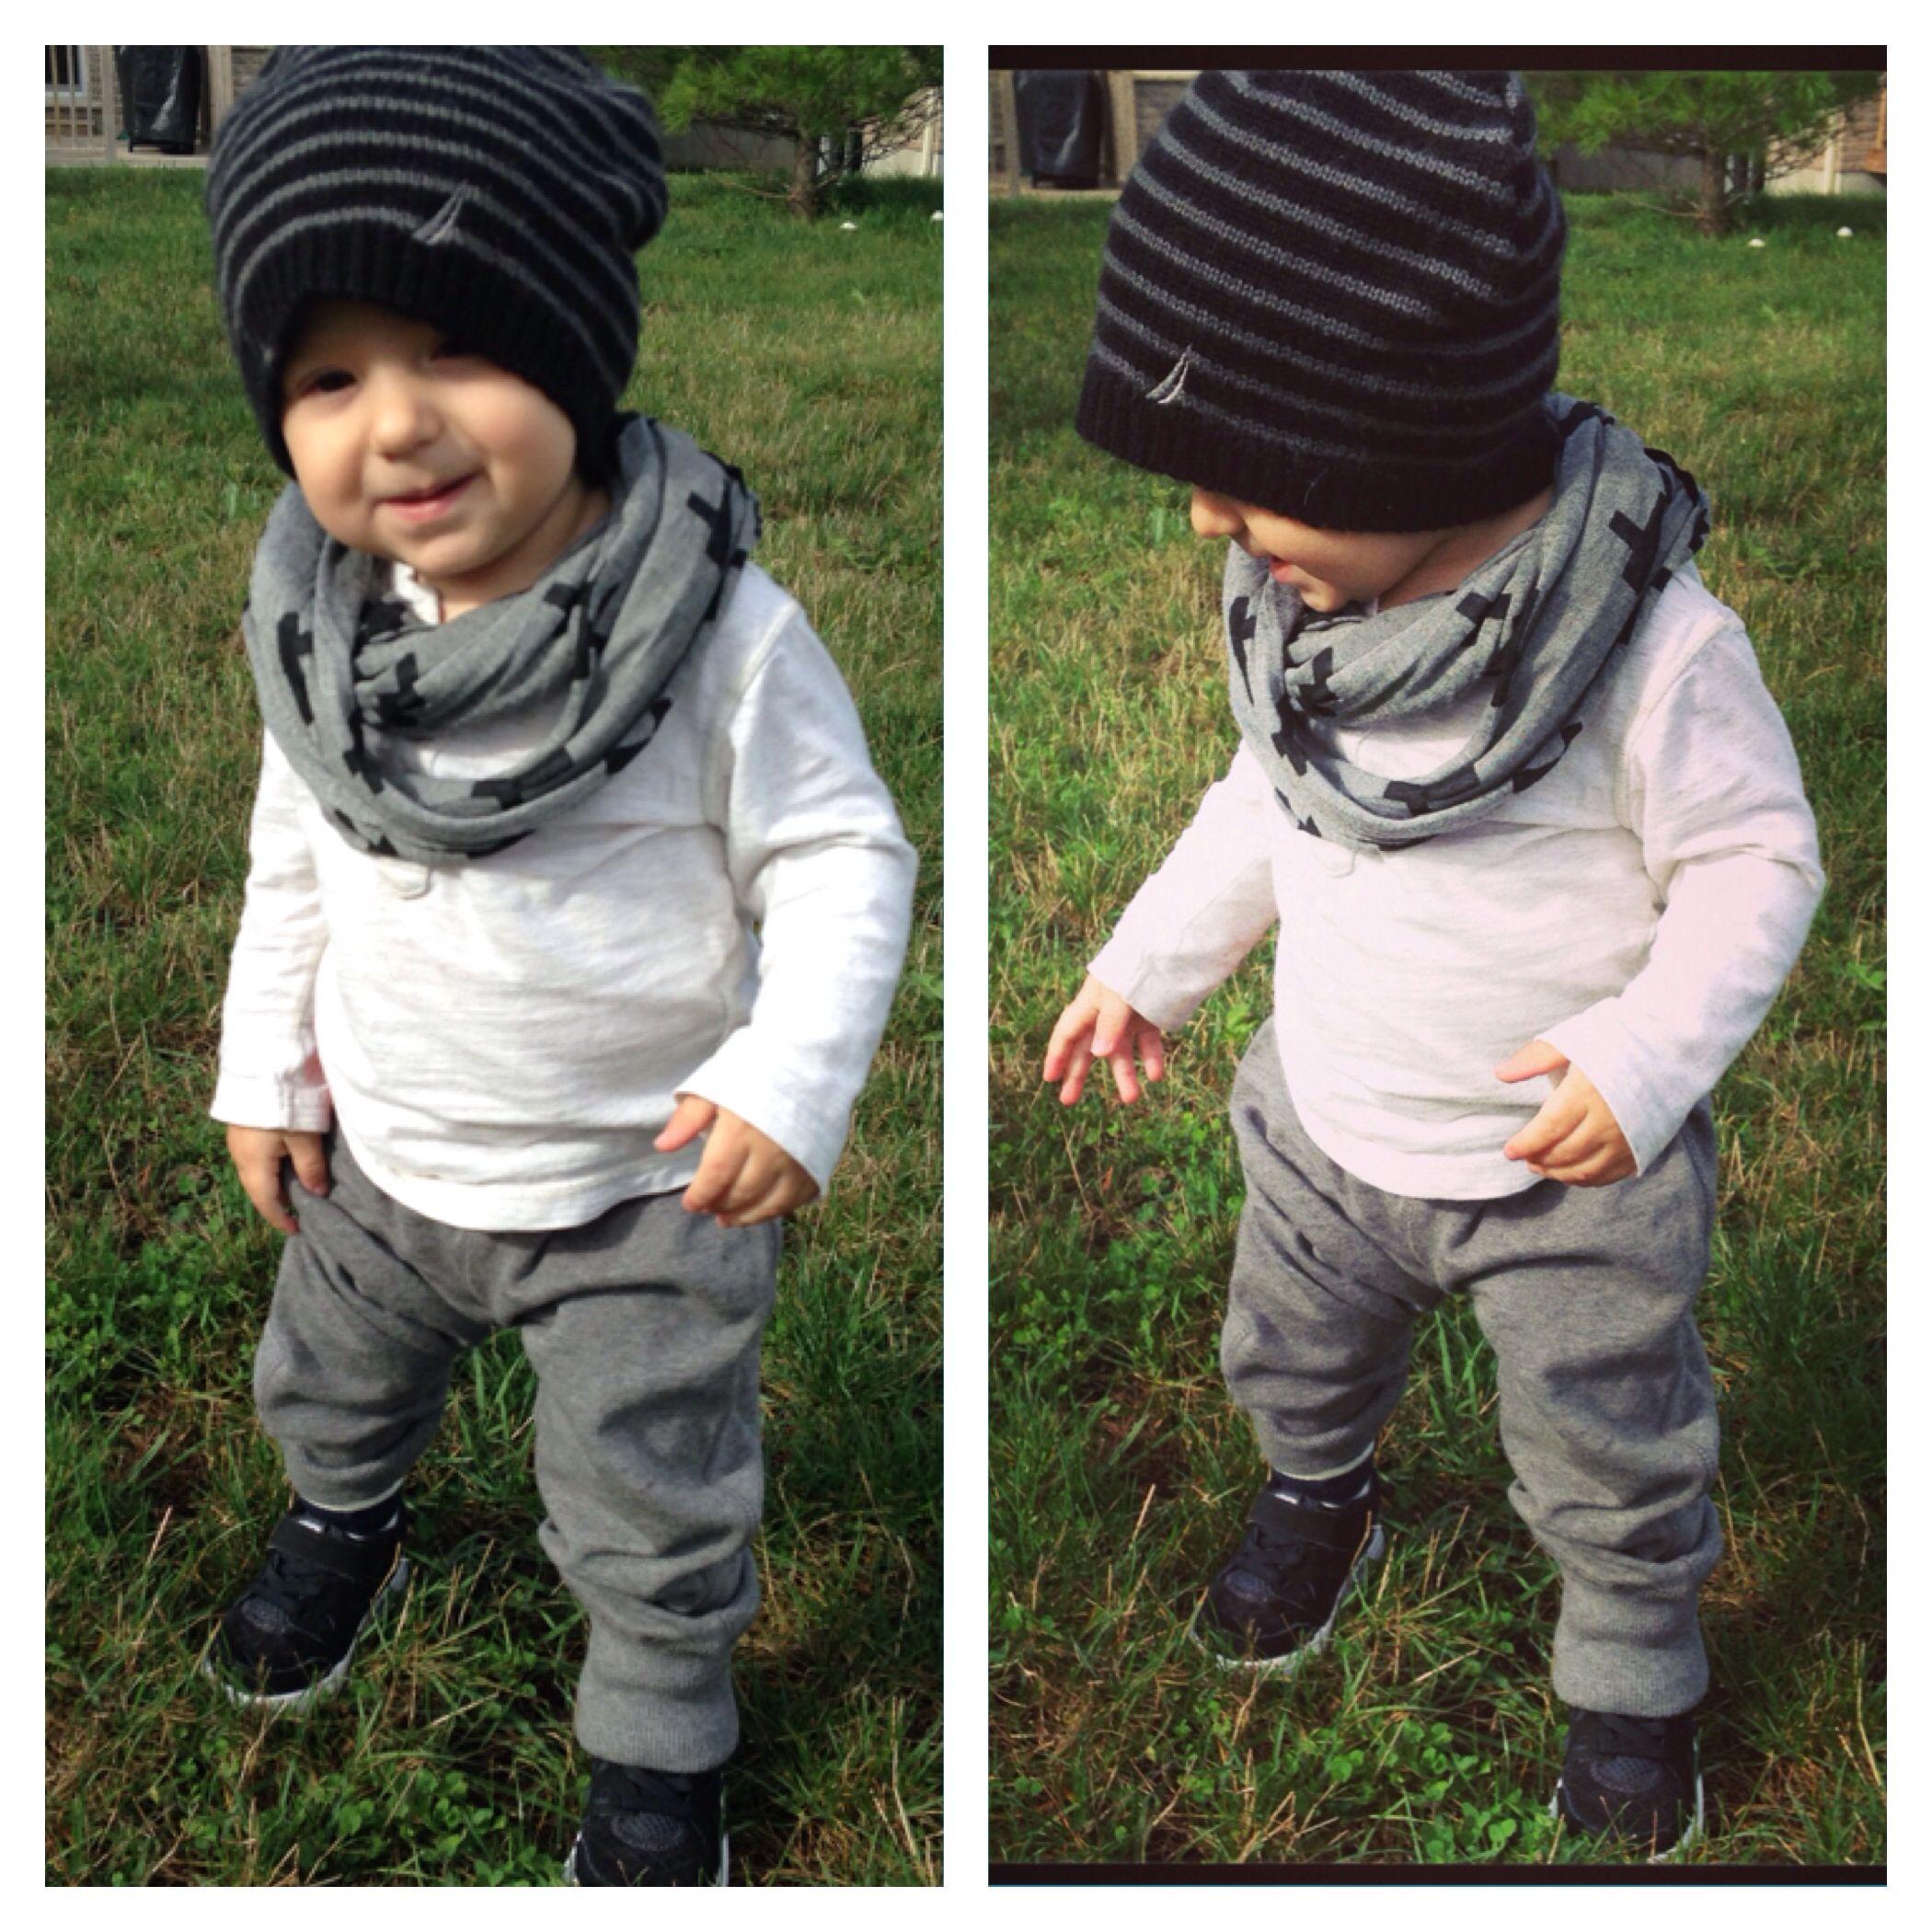 carterrunway coole baby outfits pinterest. Black Bedroom Furniture Sets. Home Design Ideas